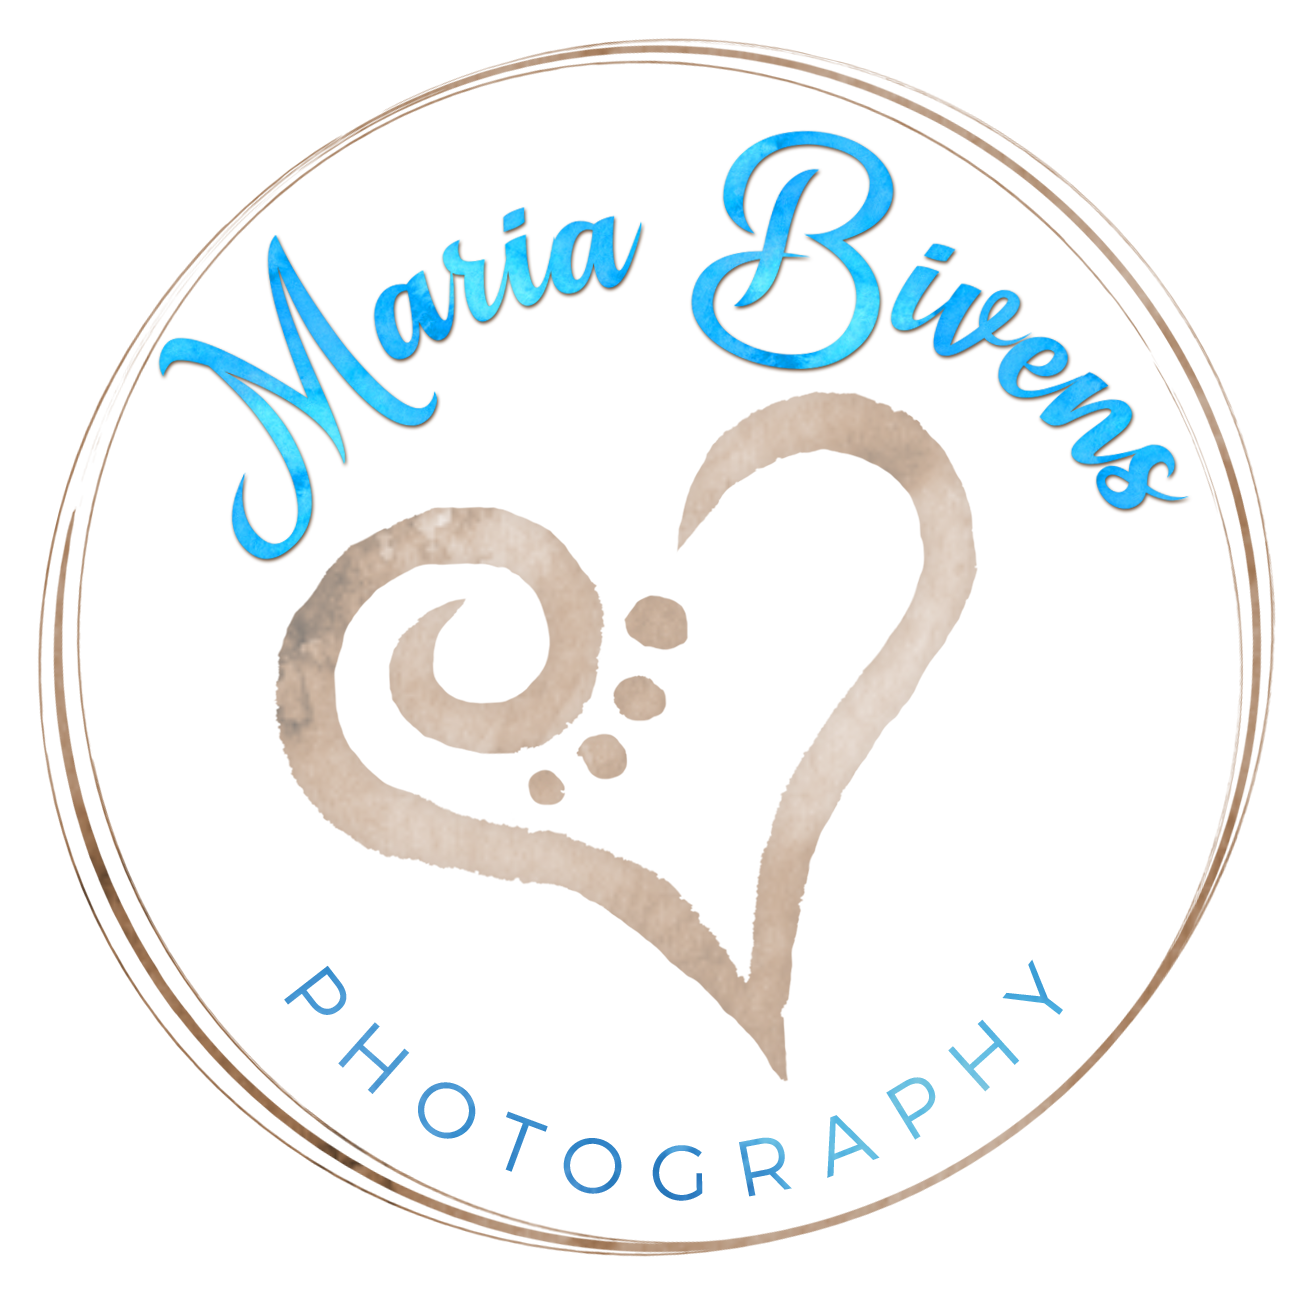 Maria Bivens